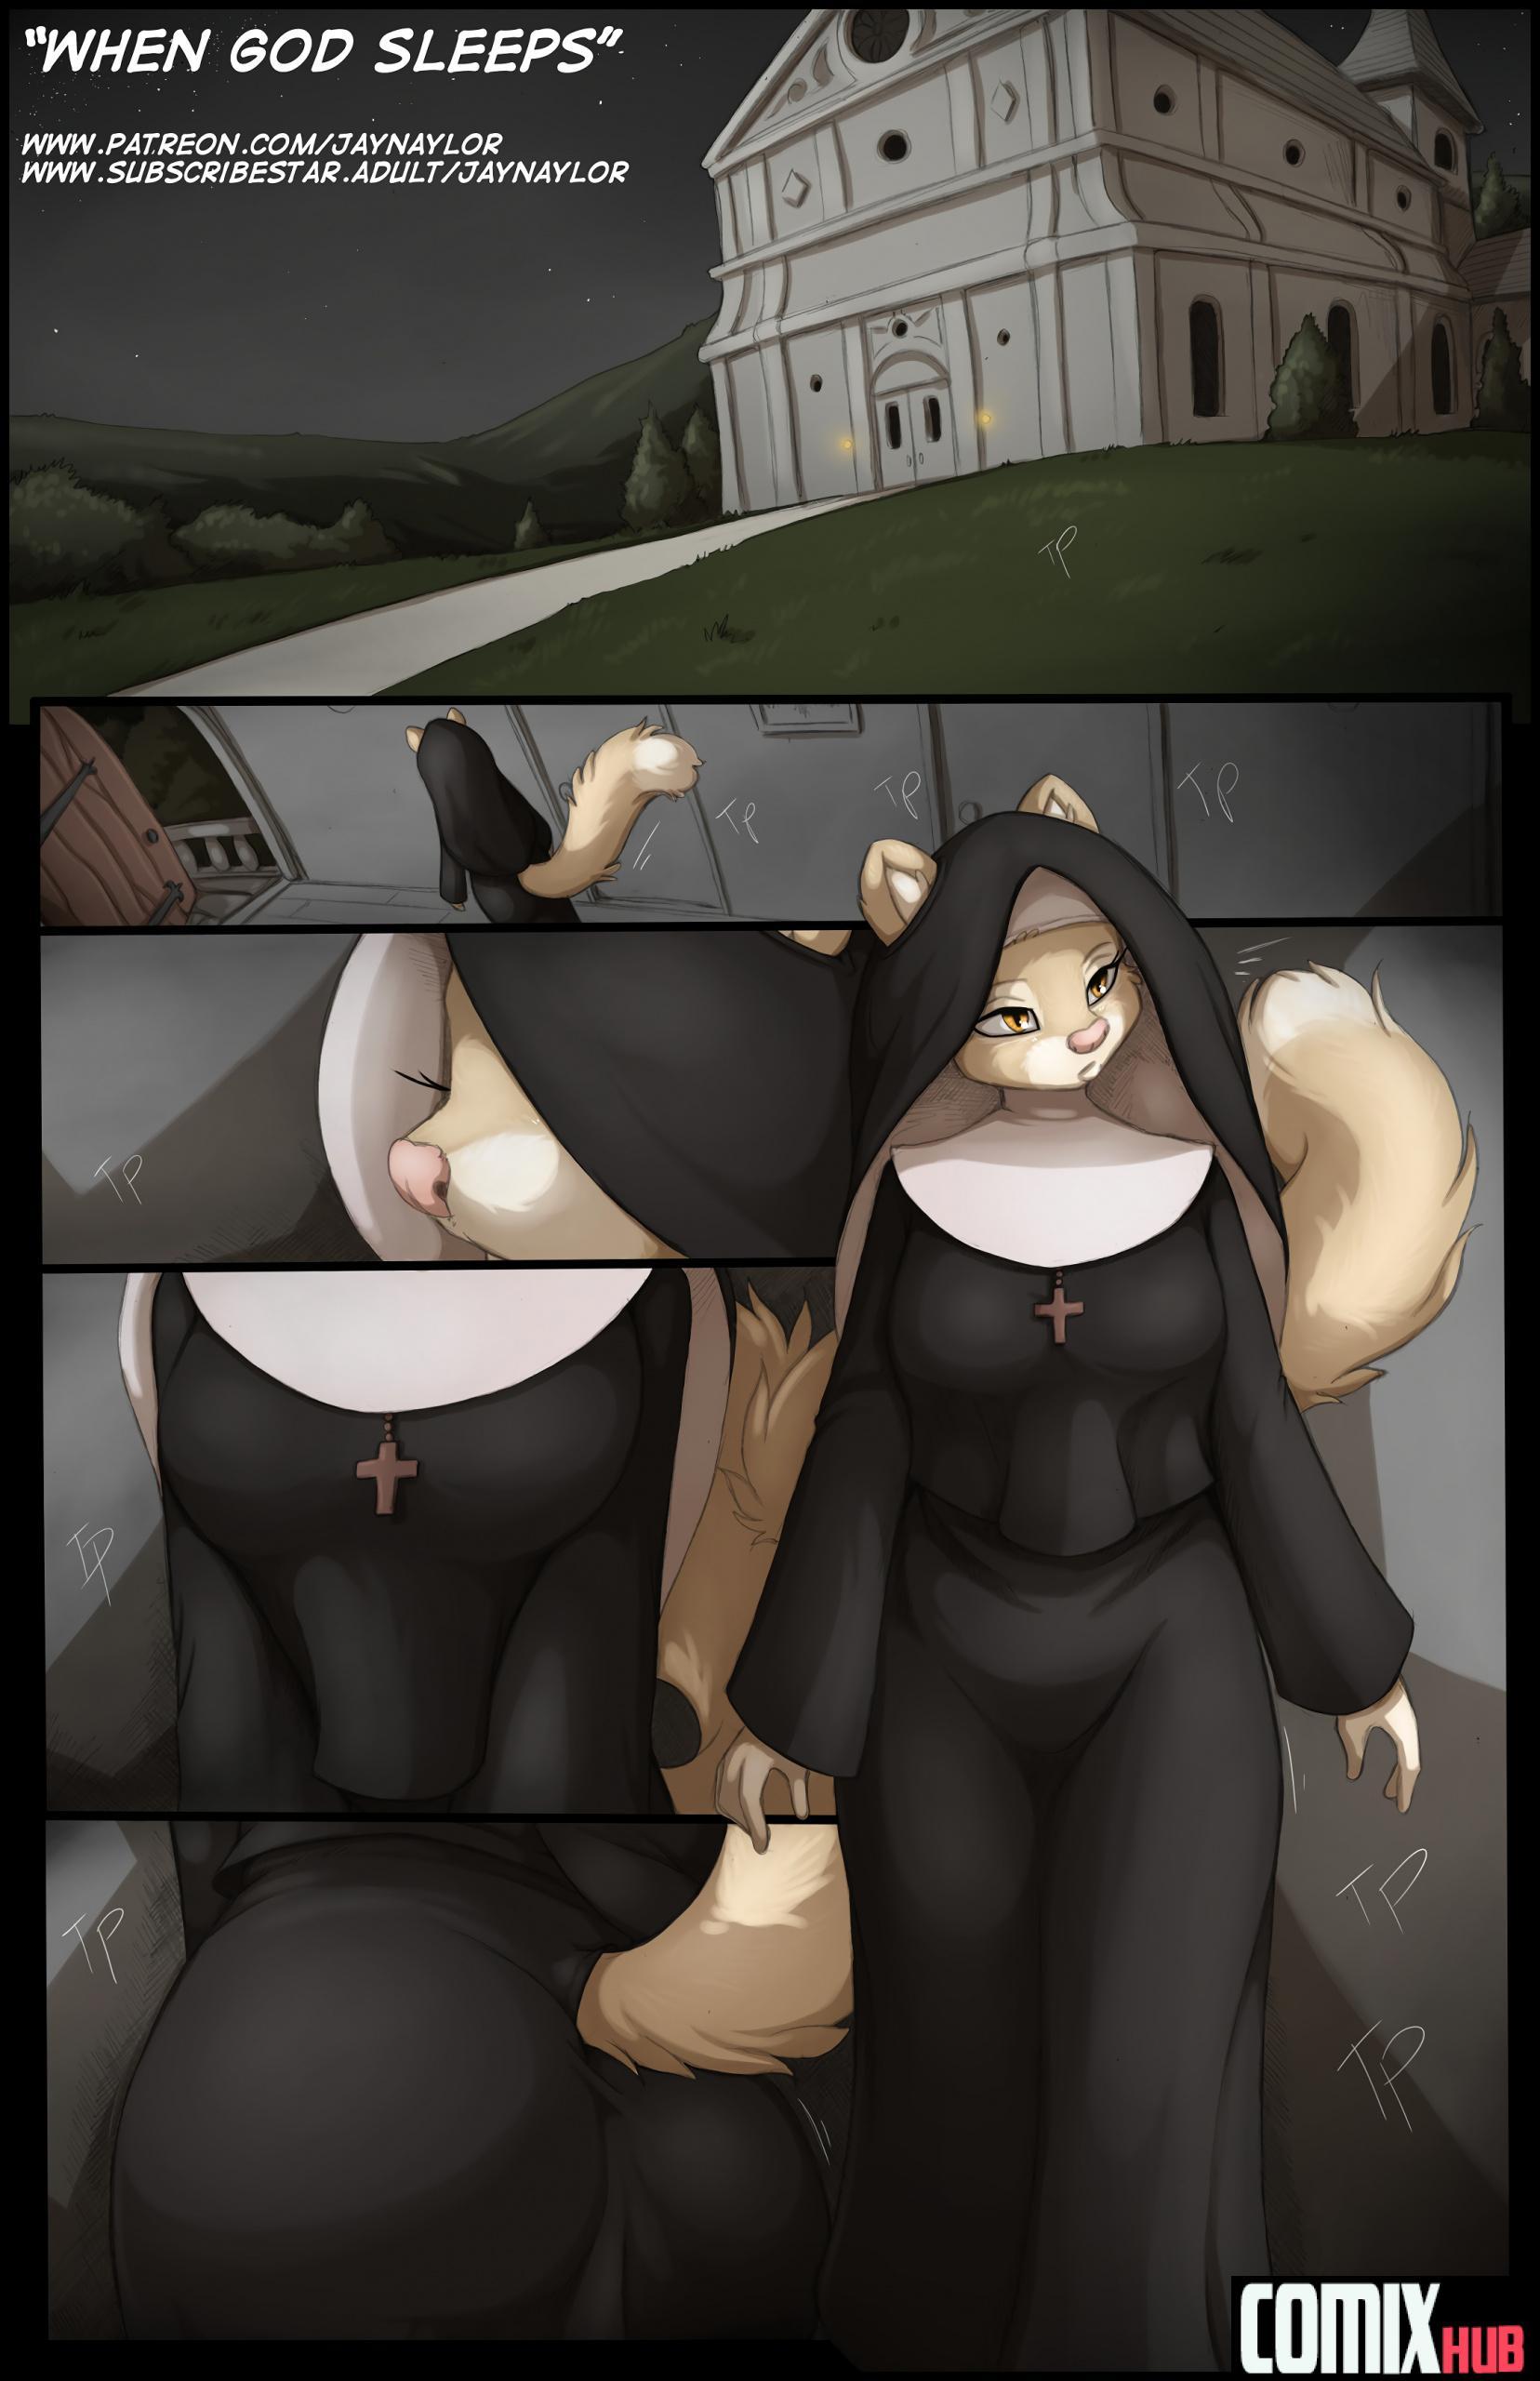 Porn comics, When God Sleeps Oral sex, Furry